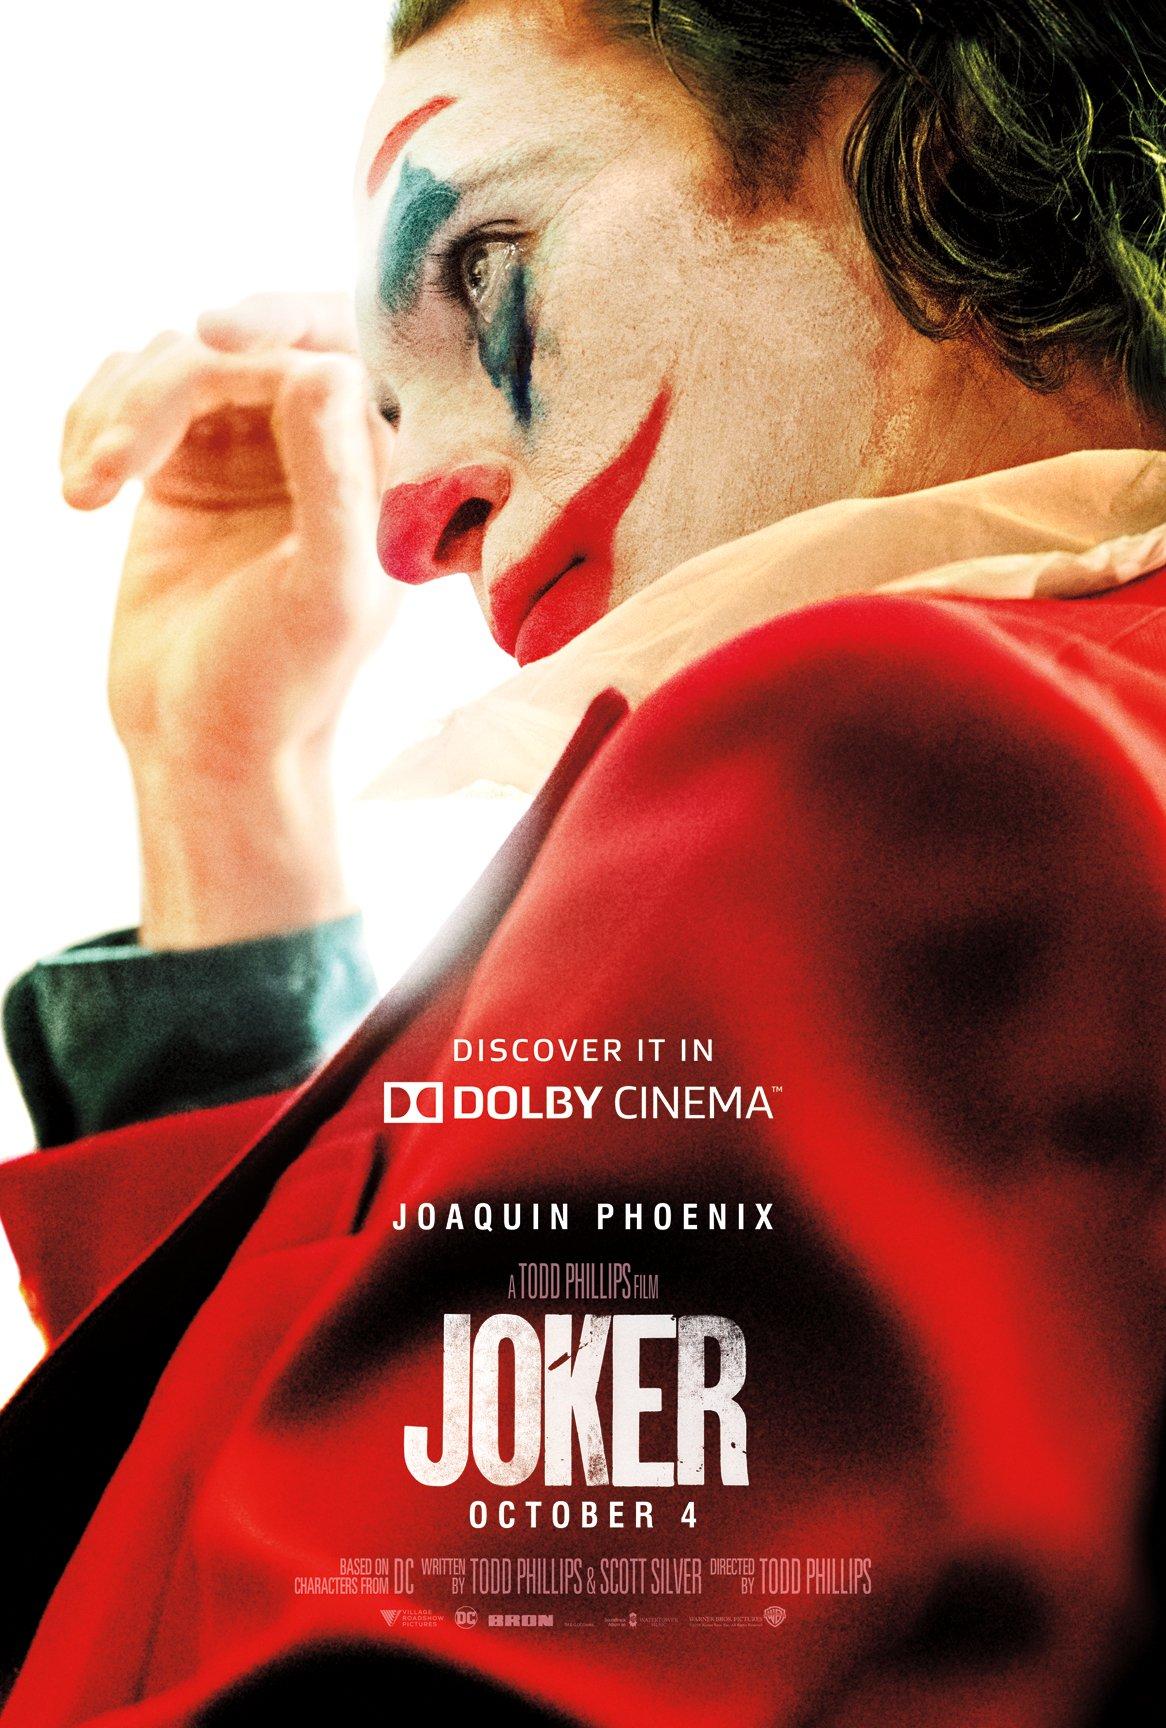 Póster Dolby Cinema de Joker (2019). Imagen: Dolby Cinema Twitter (@DolbyCinema).